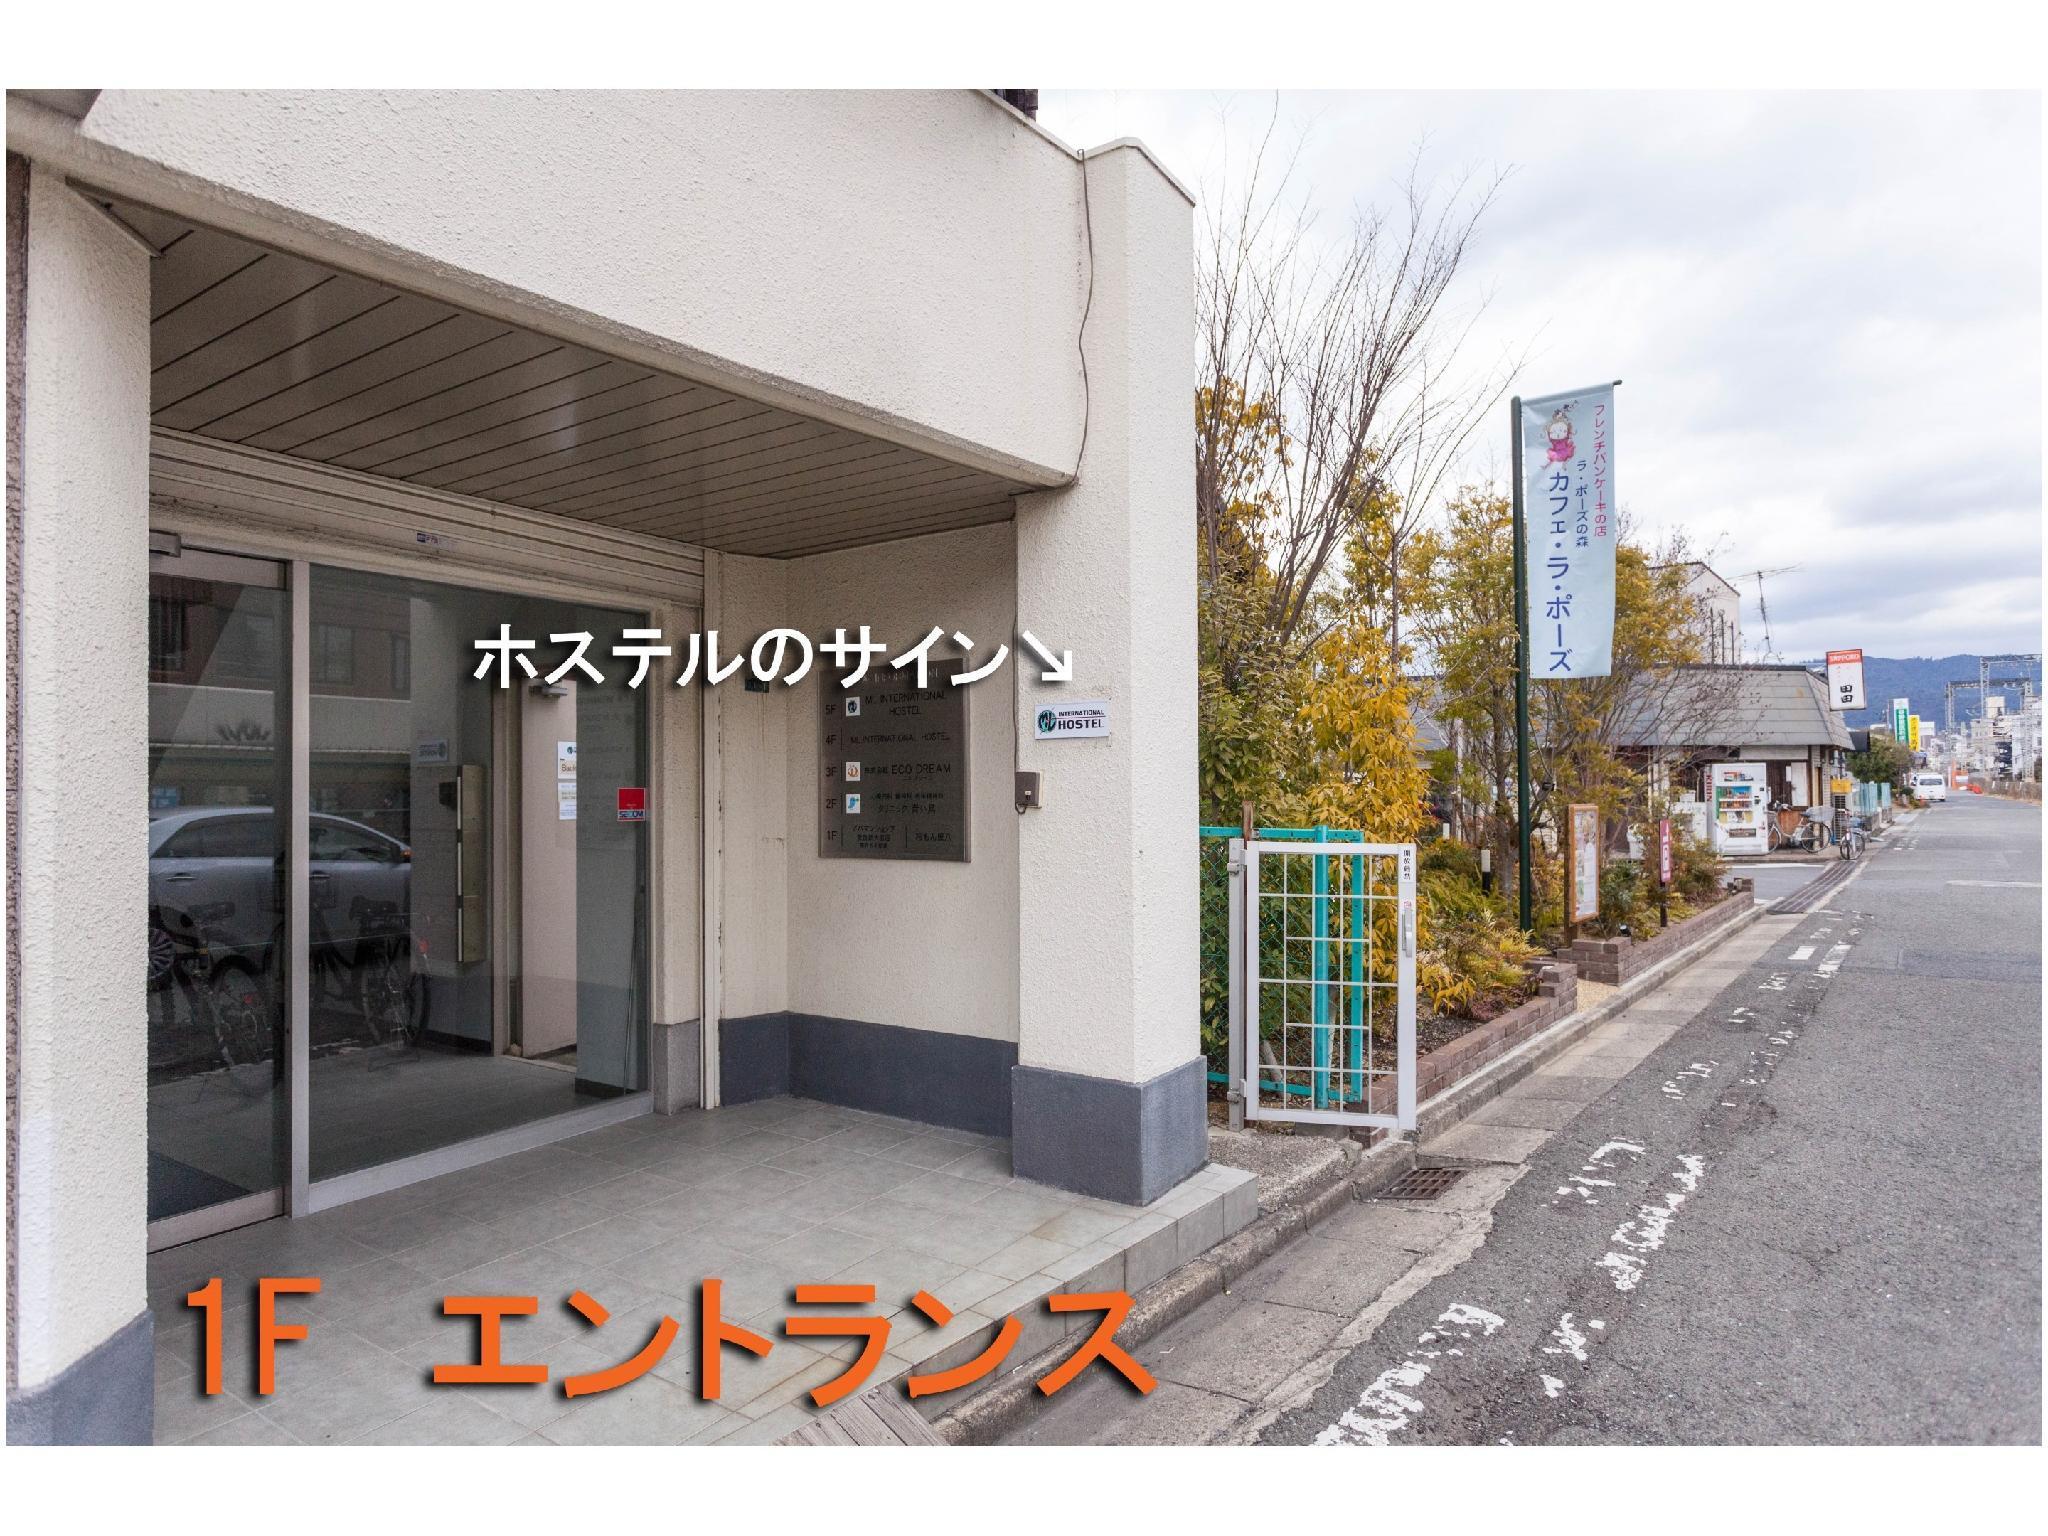 ML International Hostel